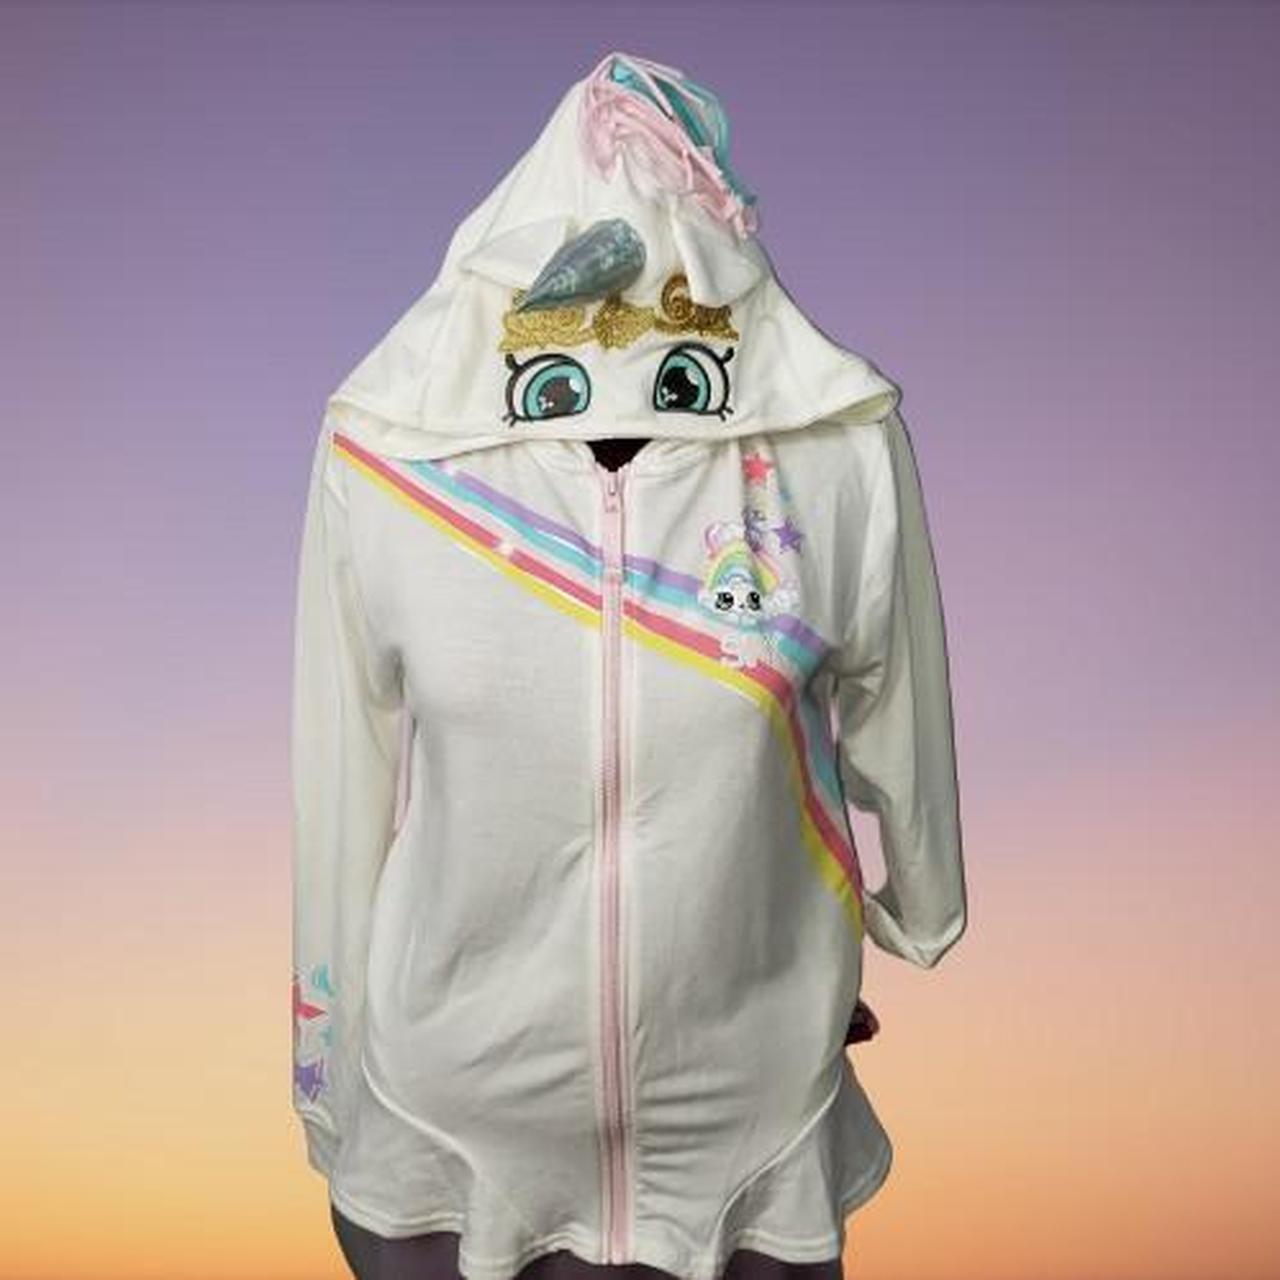 Product Image 1 - Shopkins Unicorn Hoodie in kid's